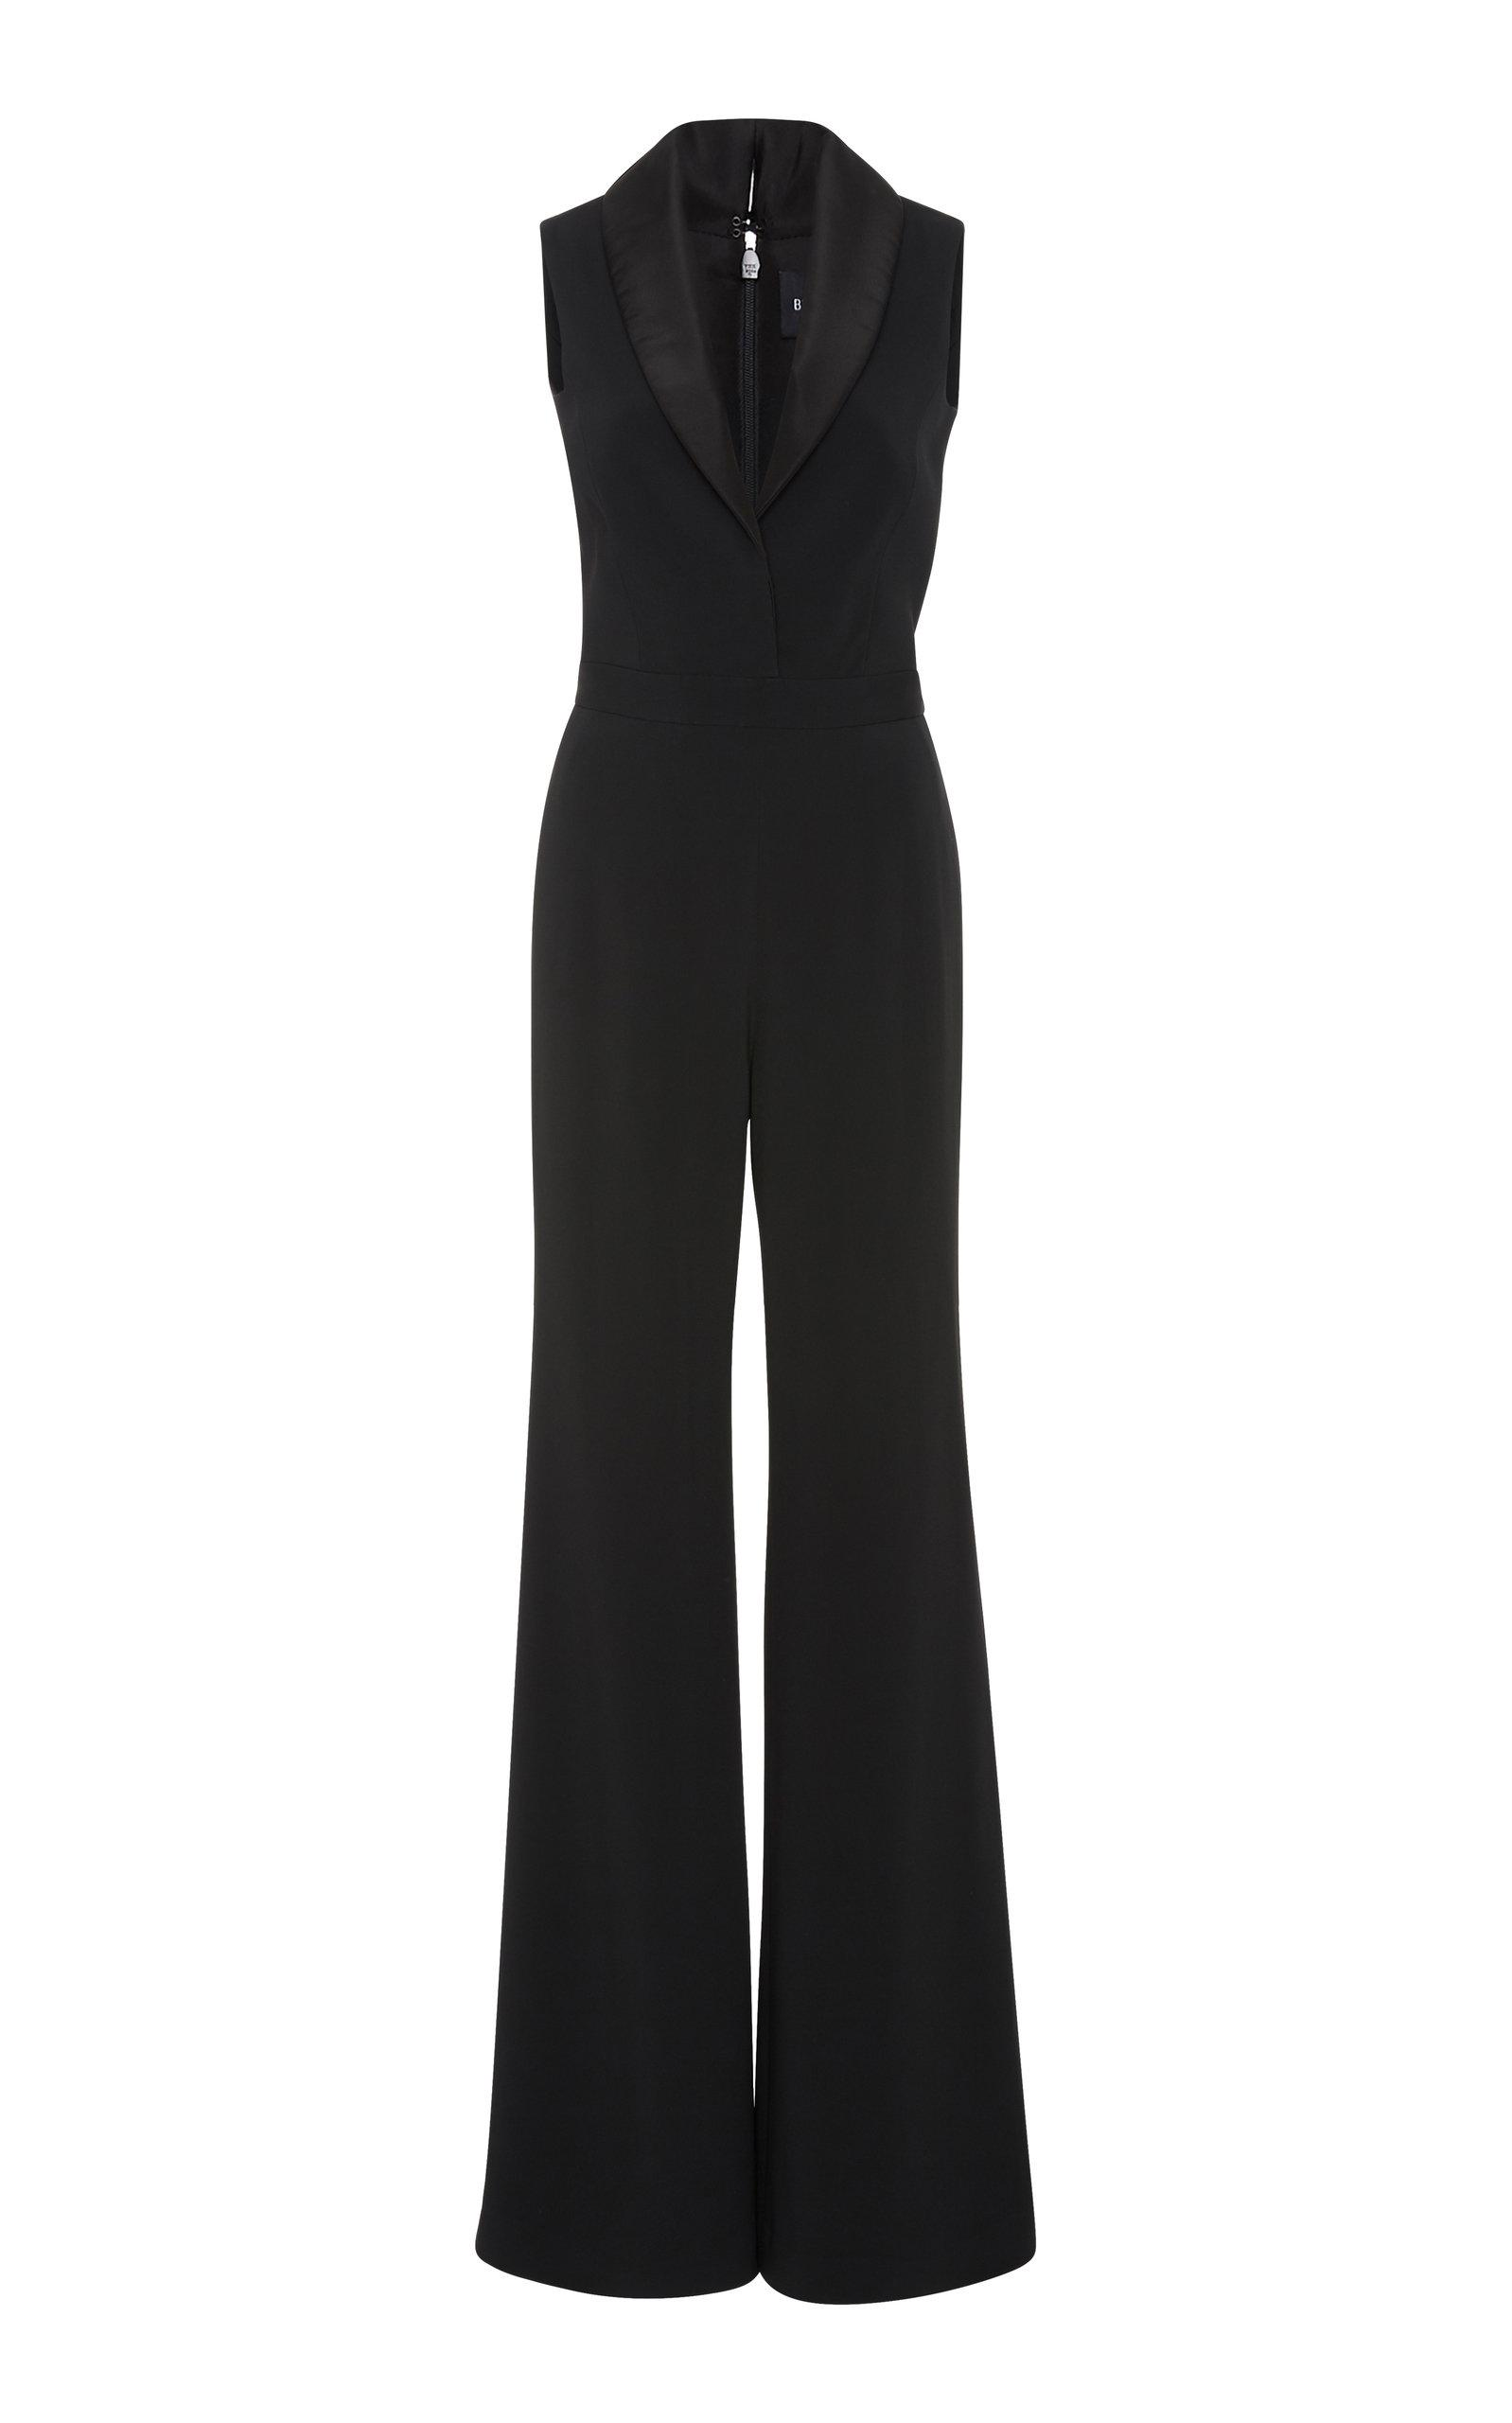 2187ae2413e1 Brandon Maxwell Shawl Collar Jumpsuit In Black